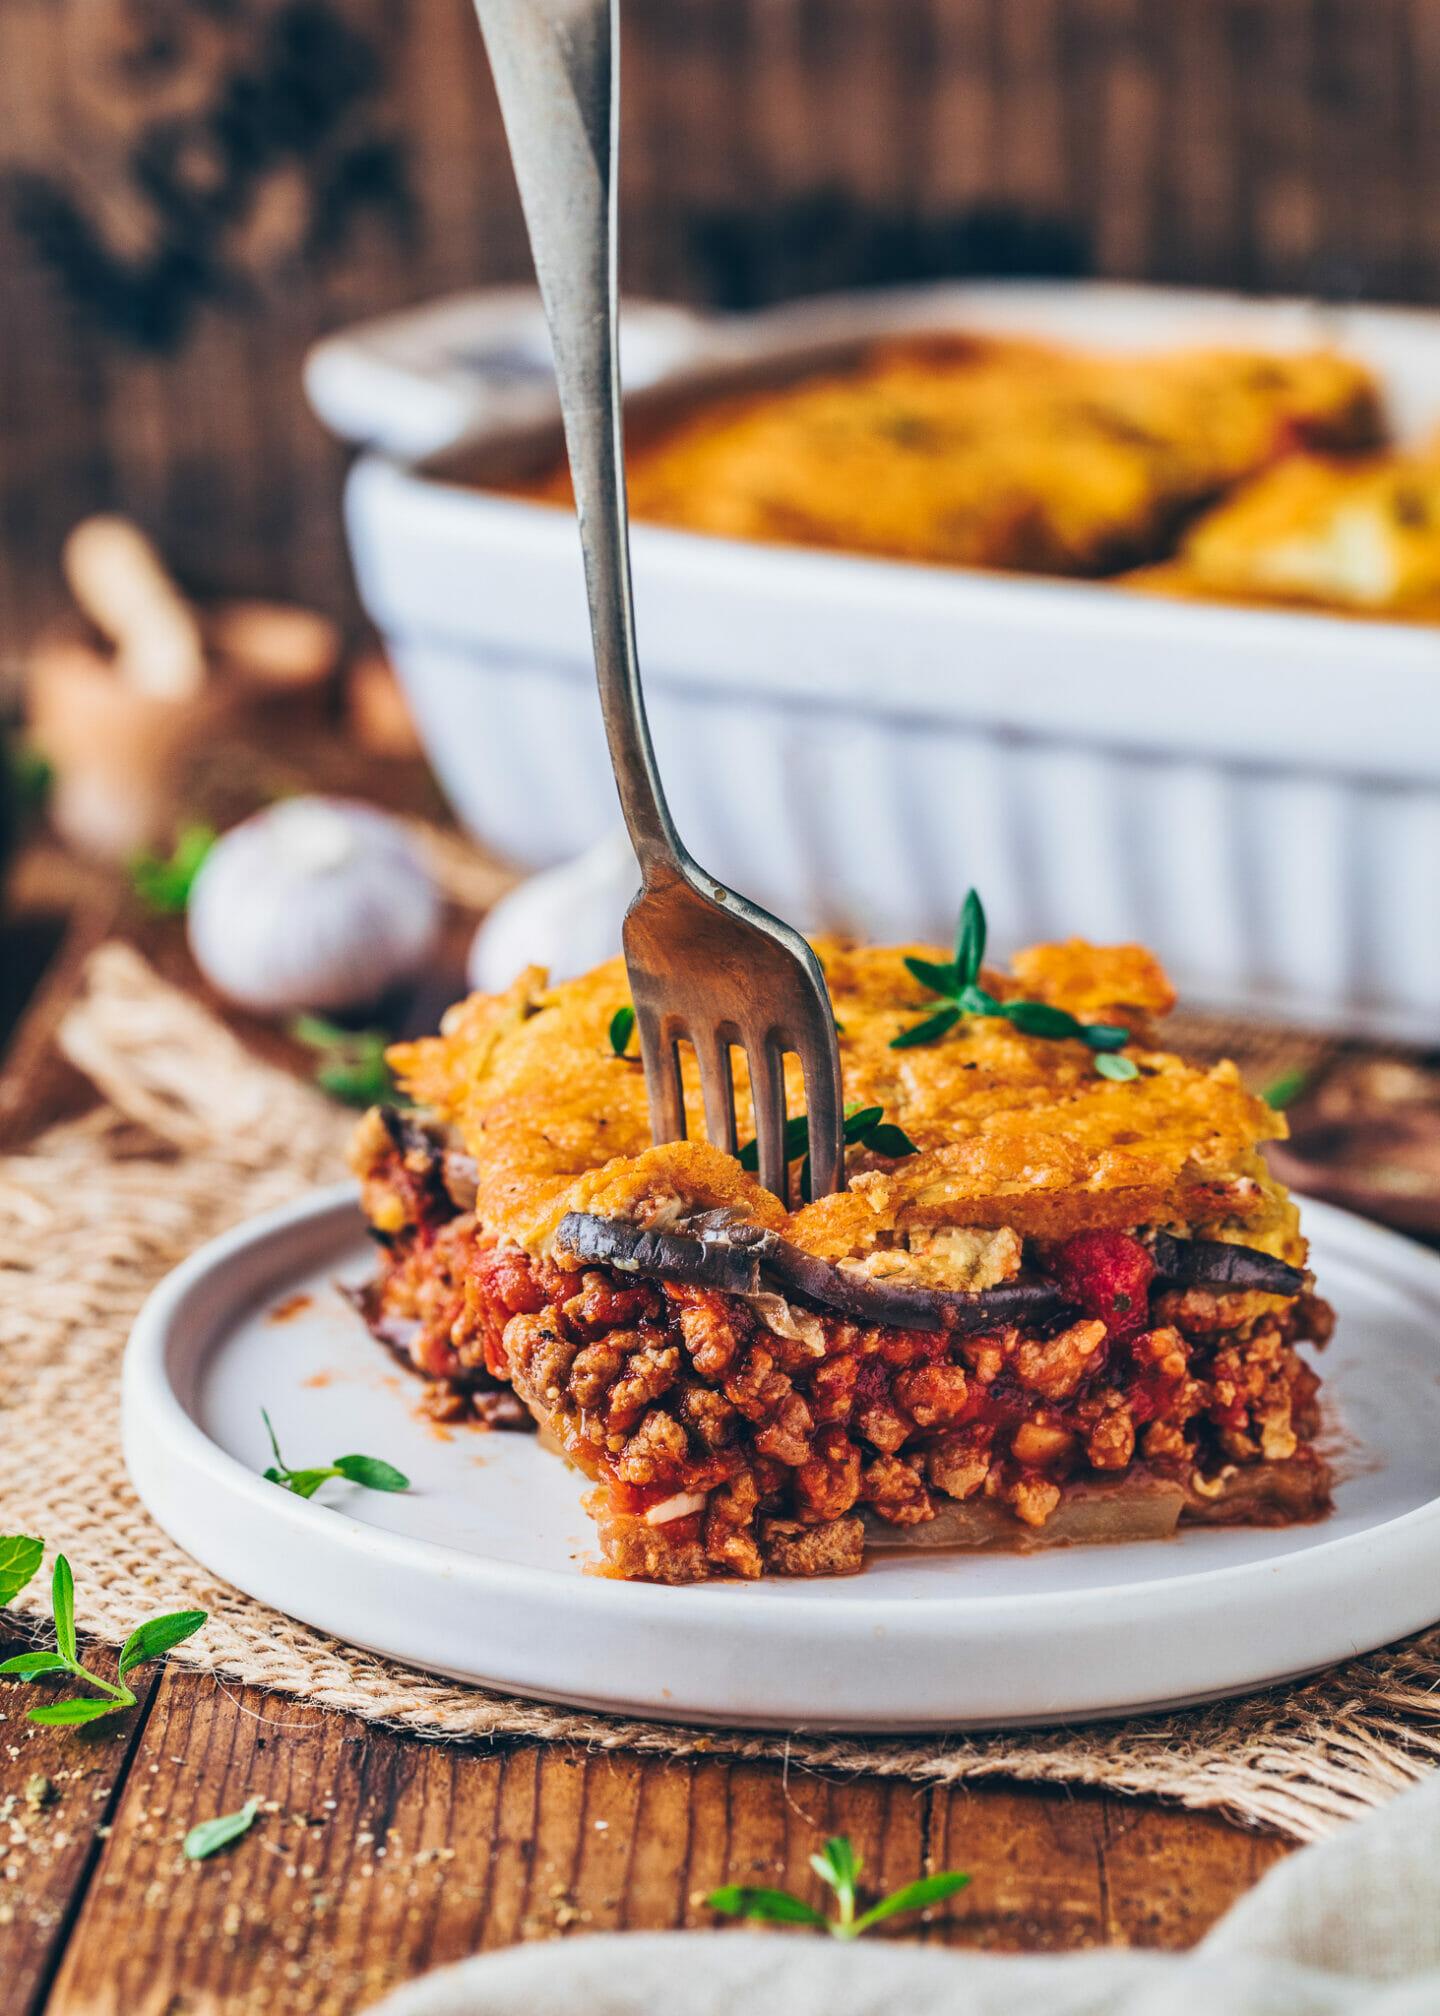 Moussaka with vegan meat tomato sauce and cashew béchamel (Greek eggplant lasagna)